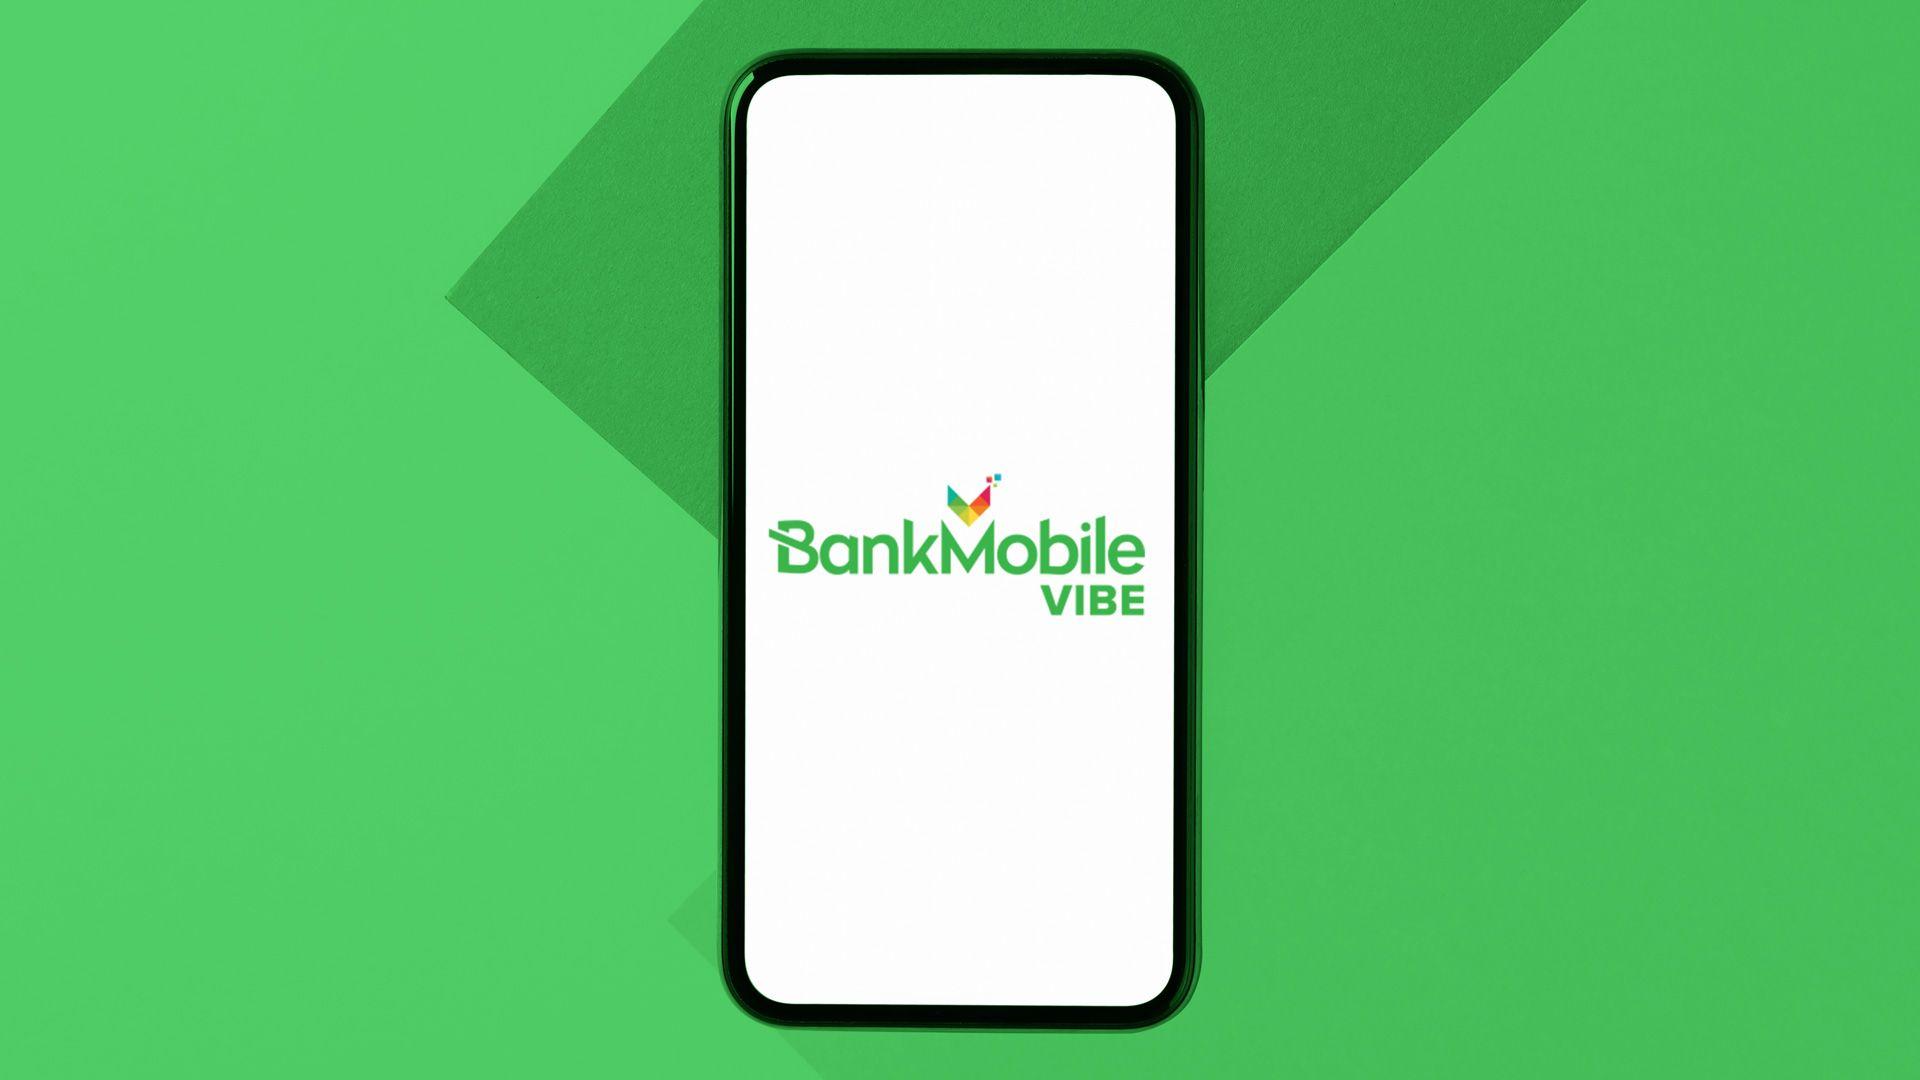 BankMobile Vibe review